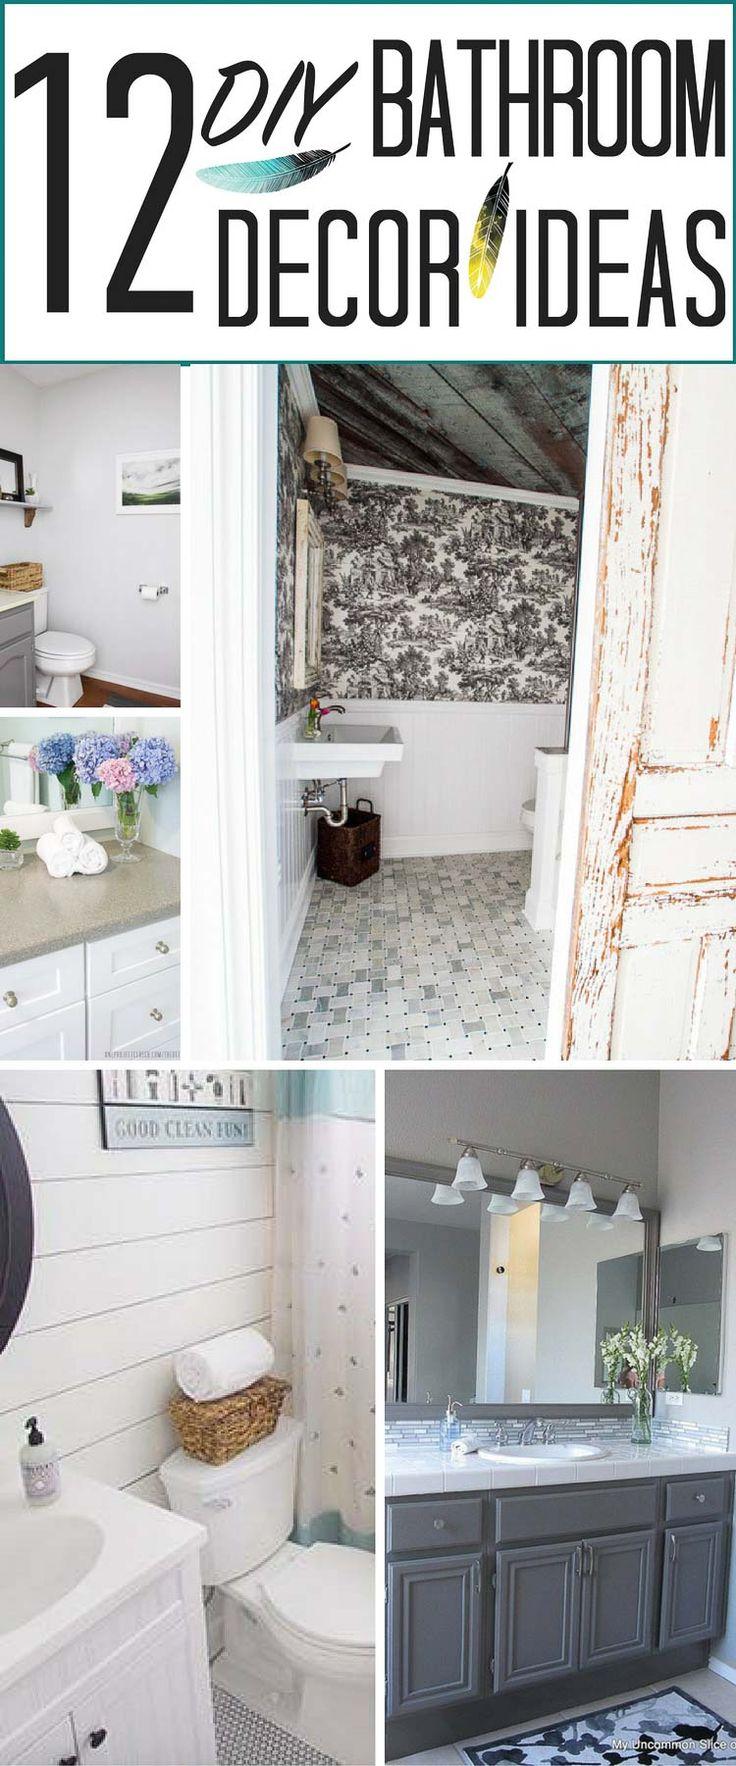 325 best Bathroom Design Ideas images on Pinterest | Bathroom ... Designs Decorating Bathroom Counte E A on